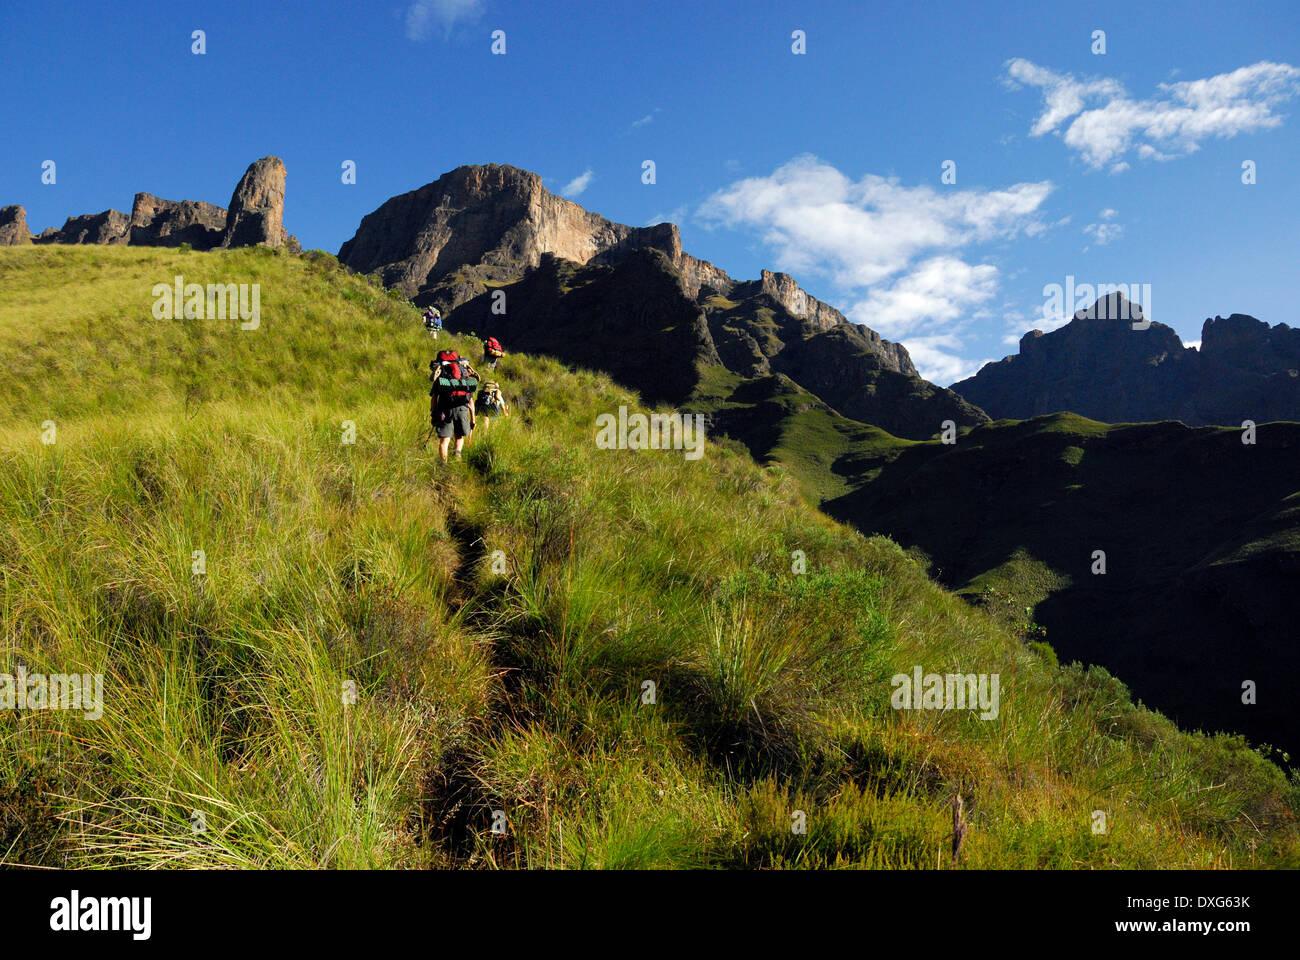 Hikers below The Molar, ascending Leslie's Pass, Drakensberg mountains. - Stock Image